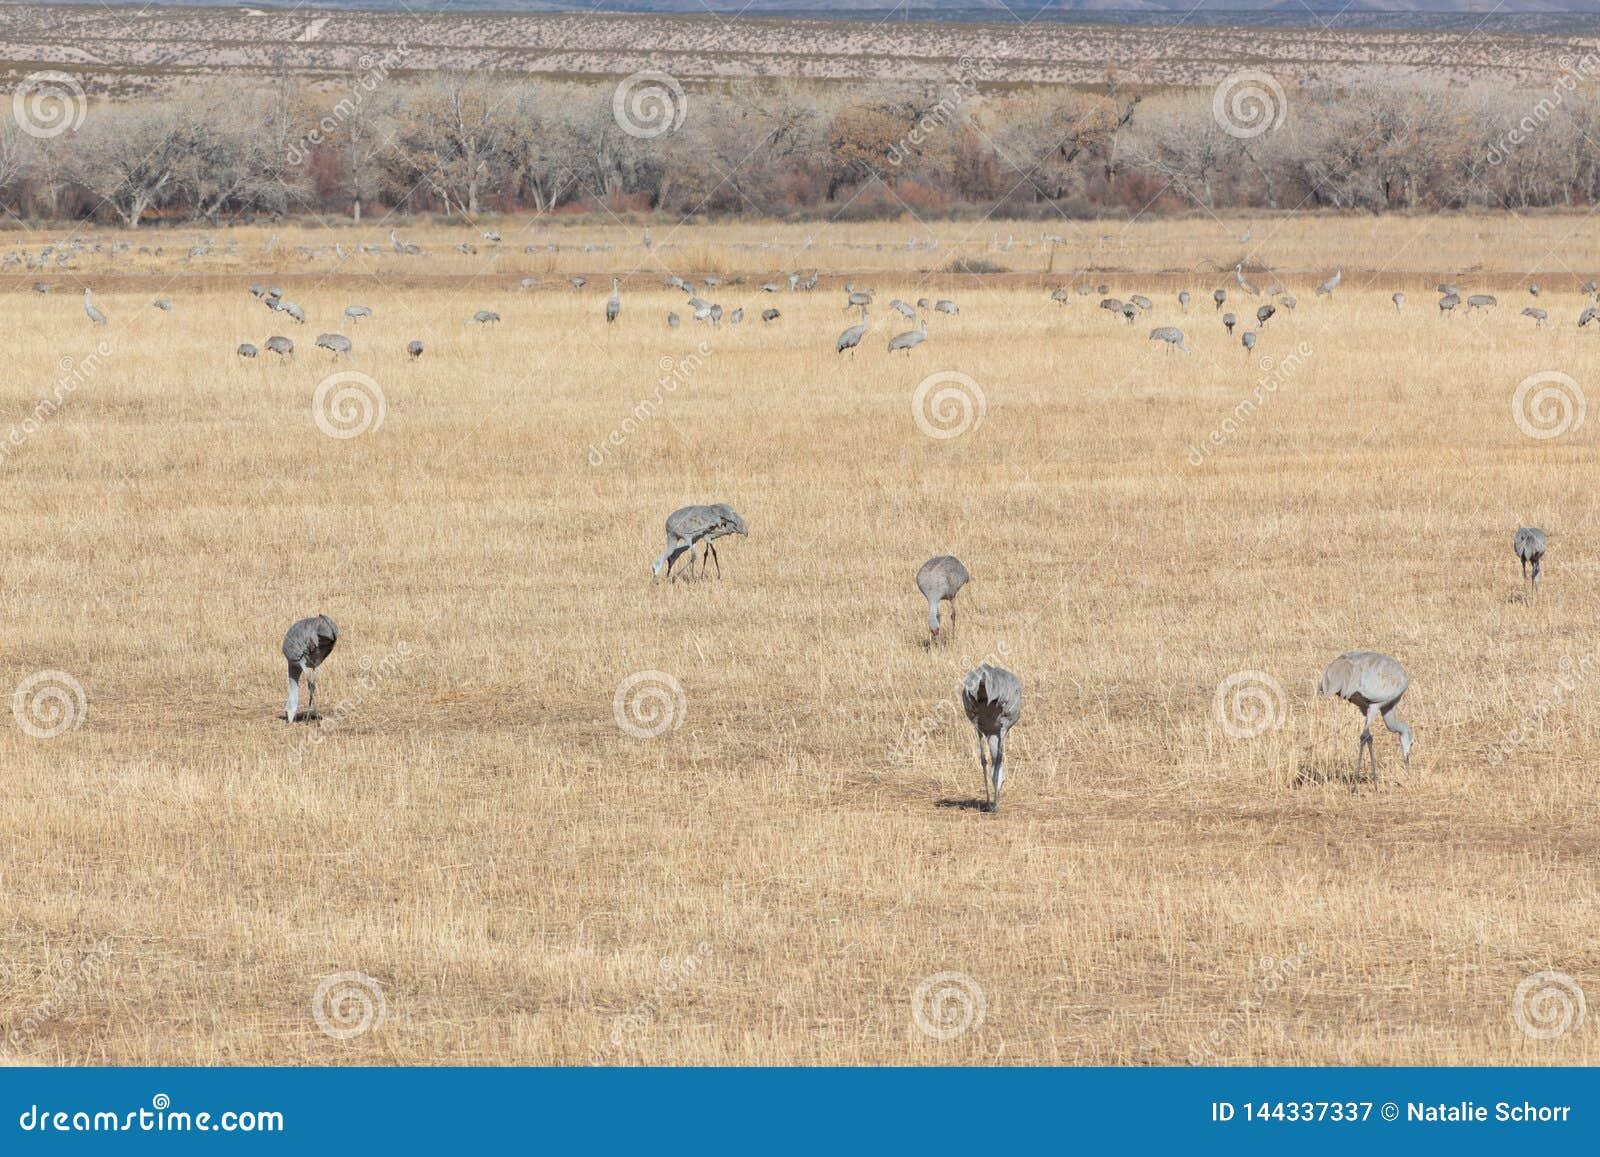 Bosque del Apache New Mexico, Sandhill cranes Antigone canadensis flock feeding in open field, eary morning winter